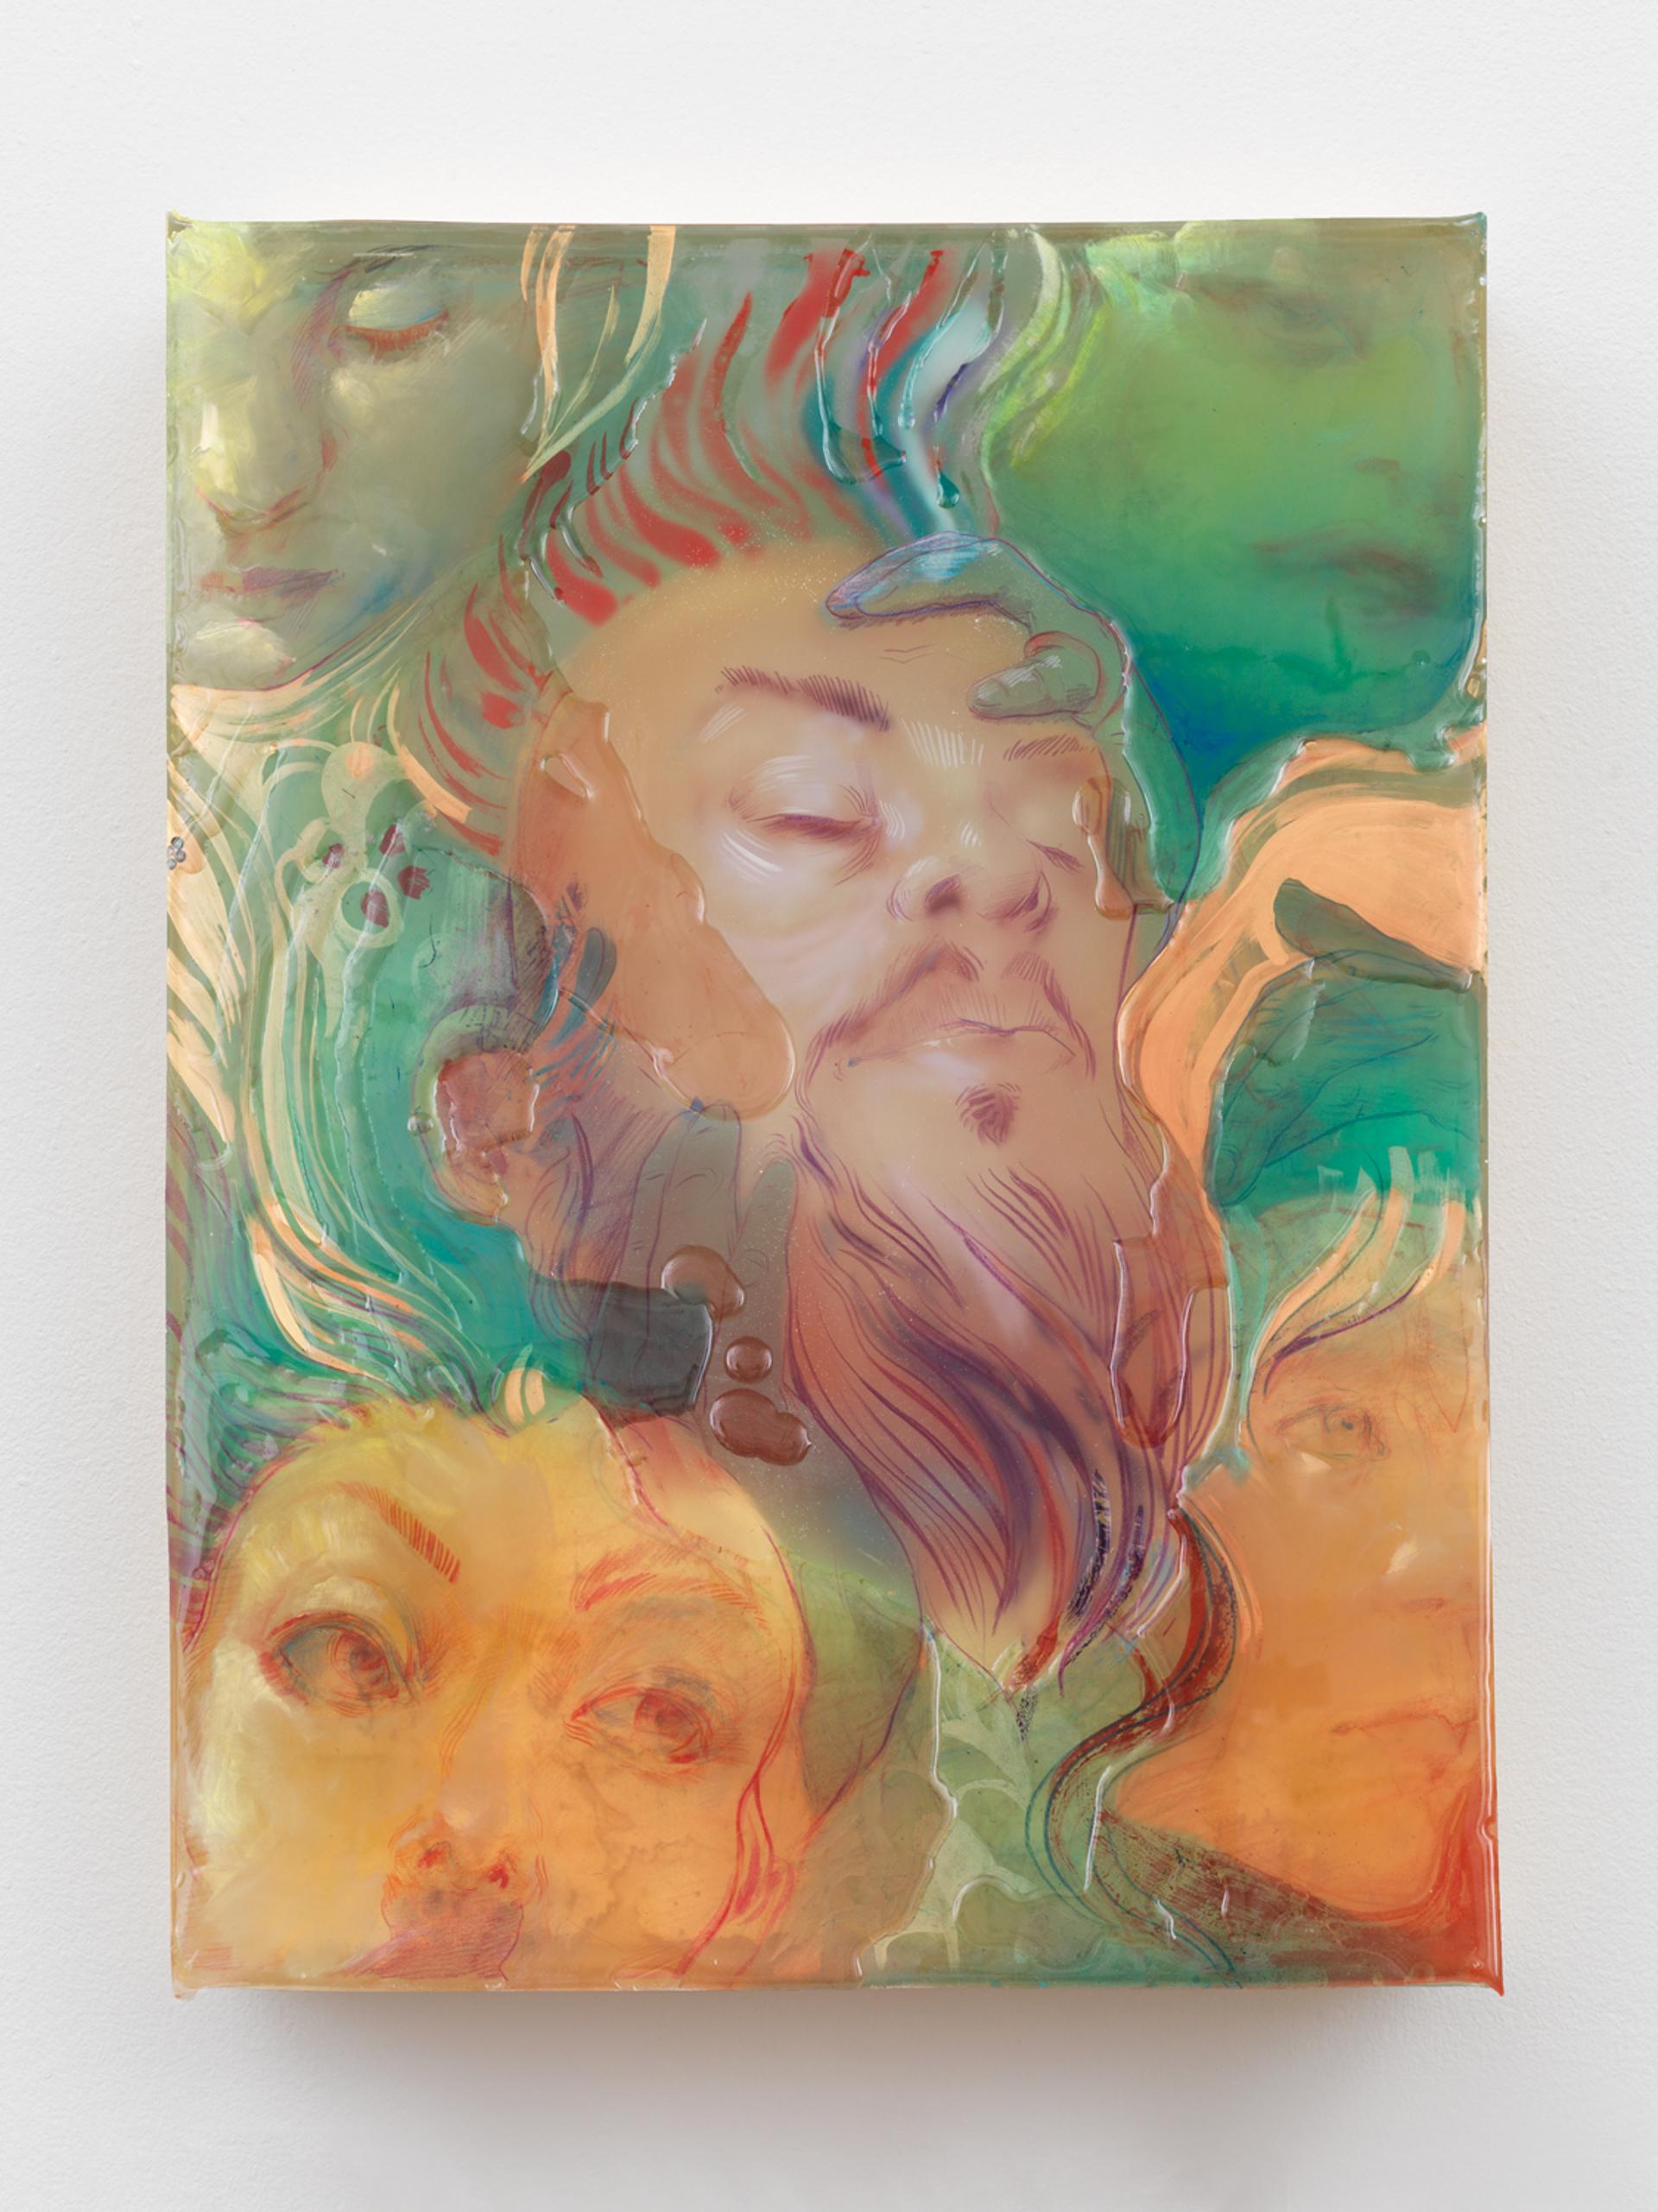 American Dream by Marc Scheff